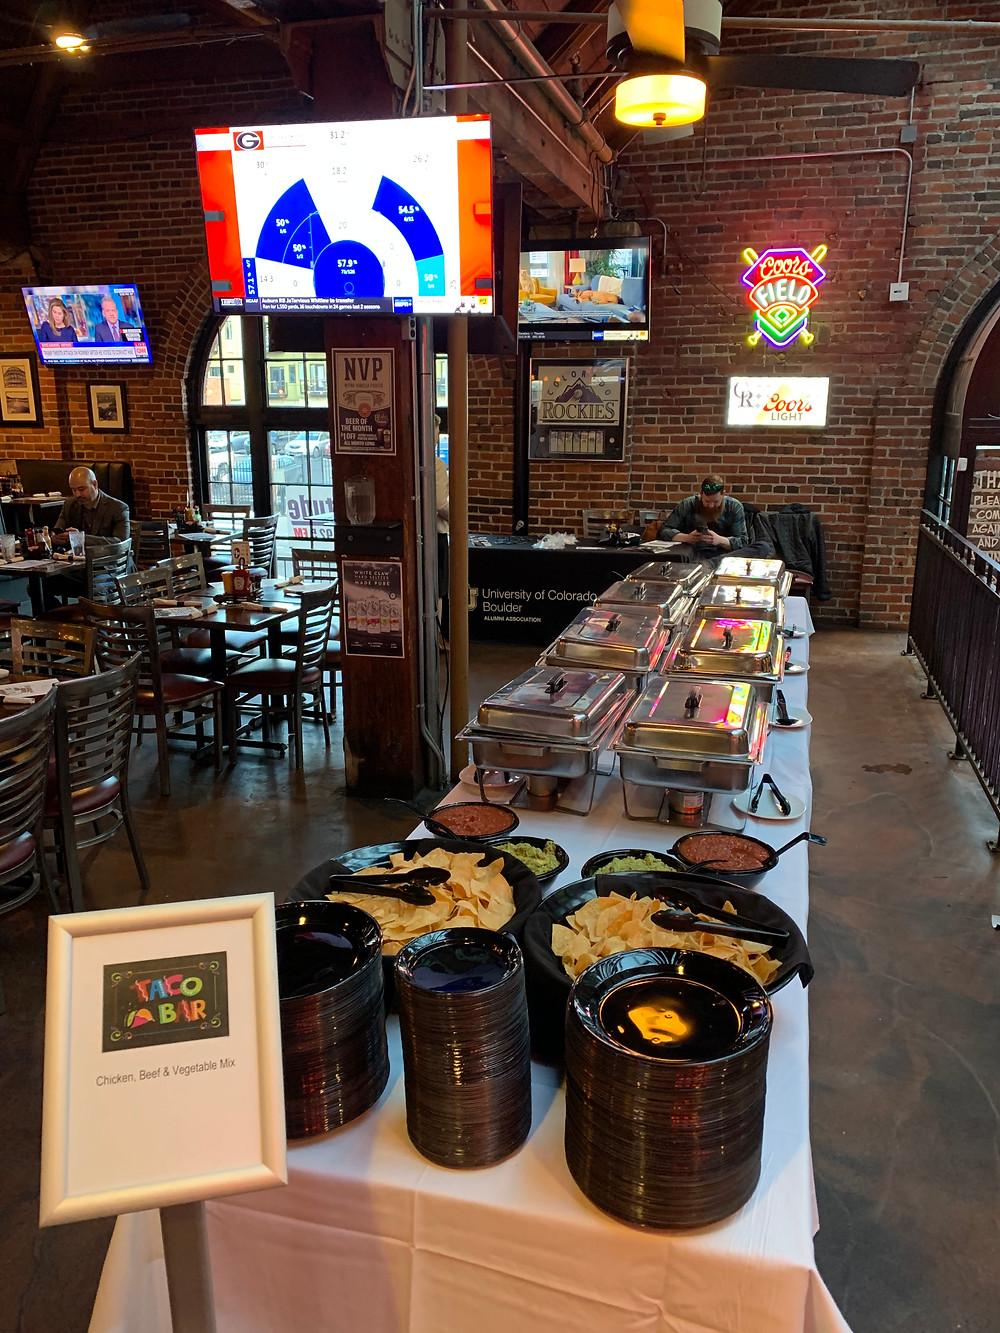 Watch CU Buffs at Blake Street Tavern - Taco Bar Buffet